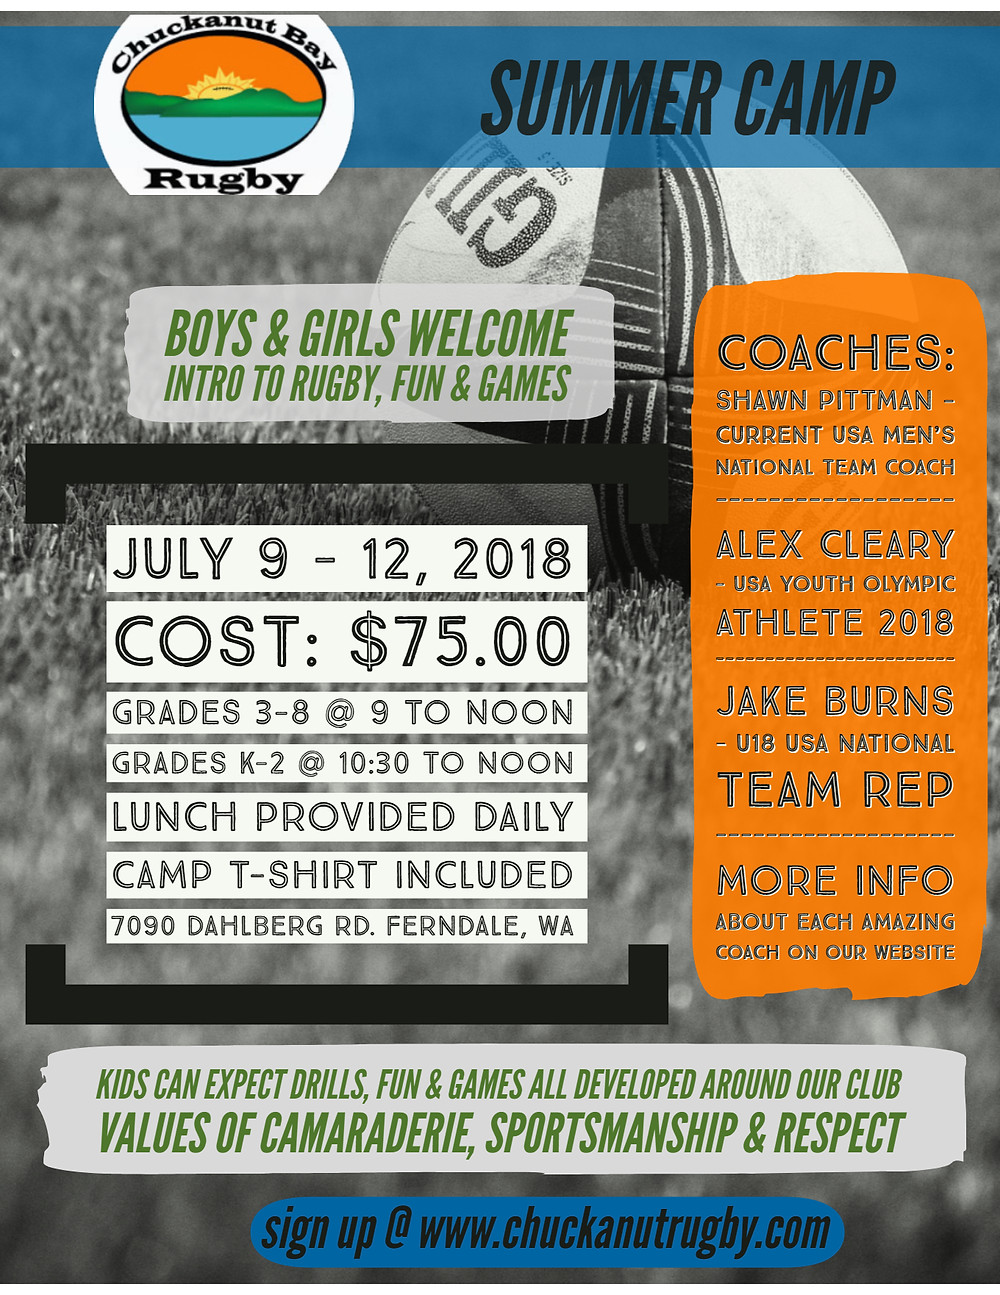 Chuckanut Bay Rugby Summer Camp